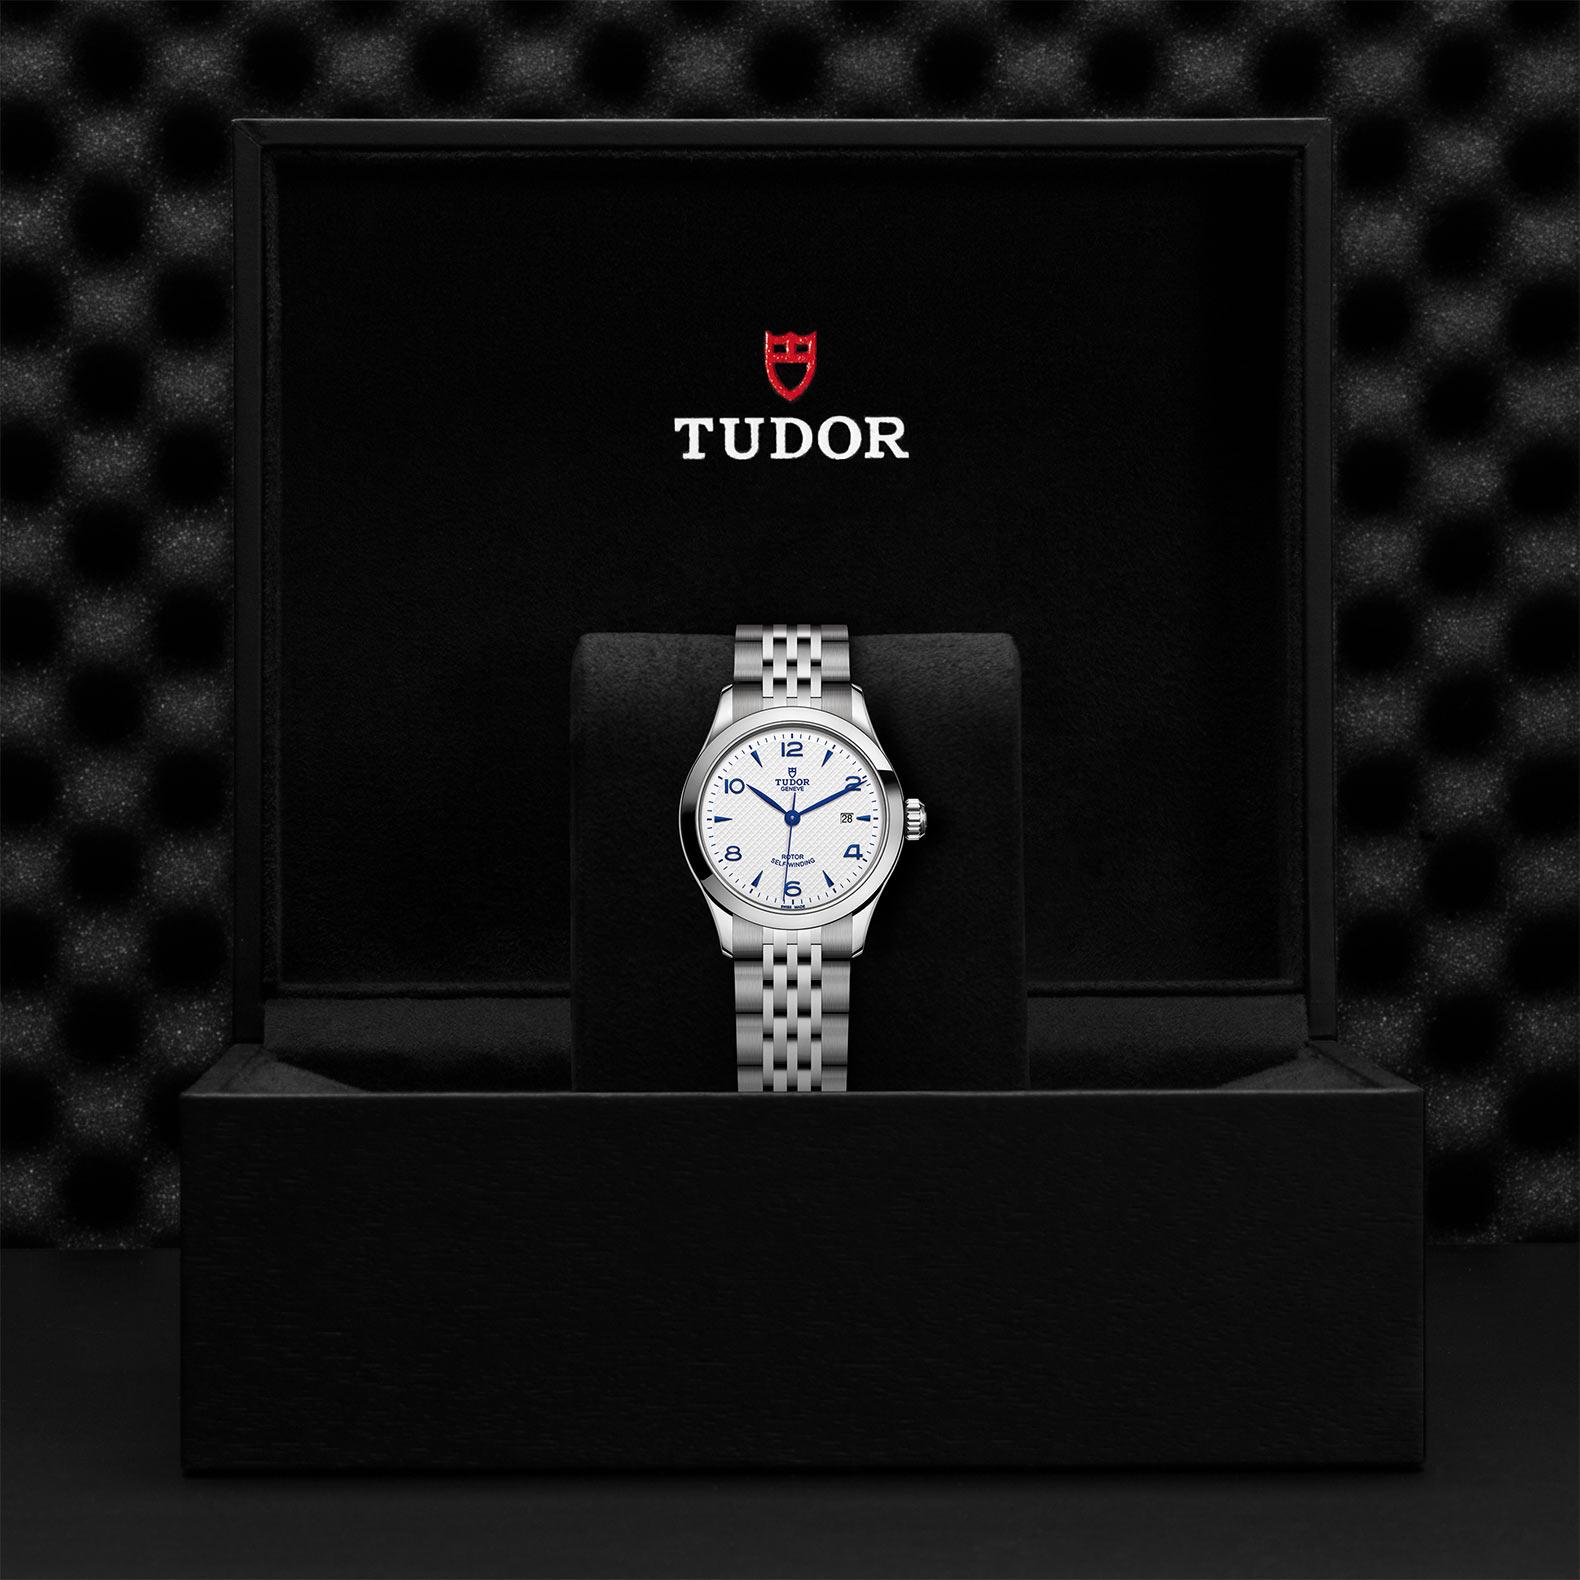 TUDOR 1926 - M91350-0005